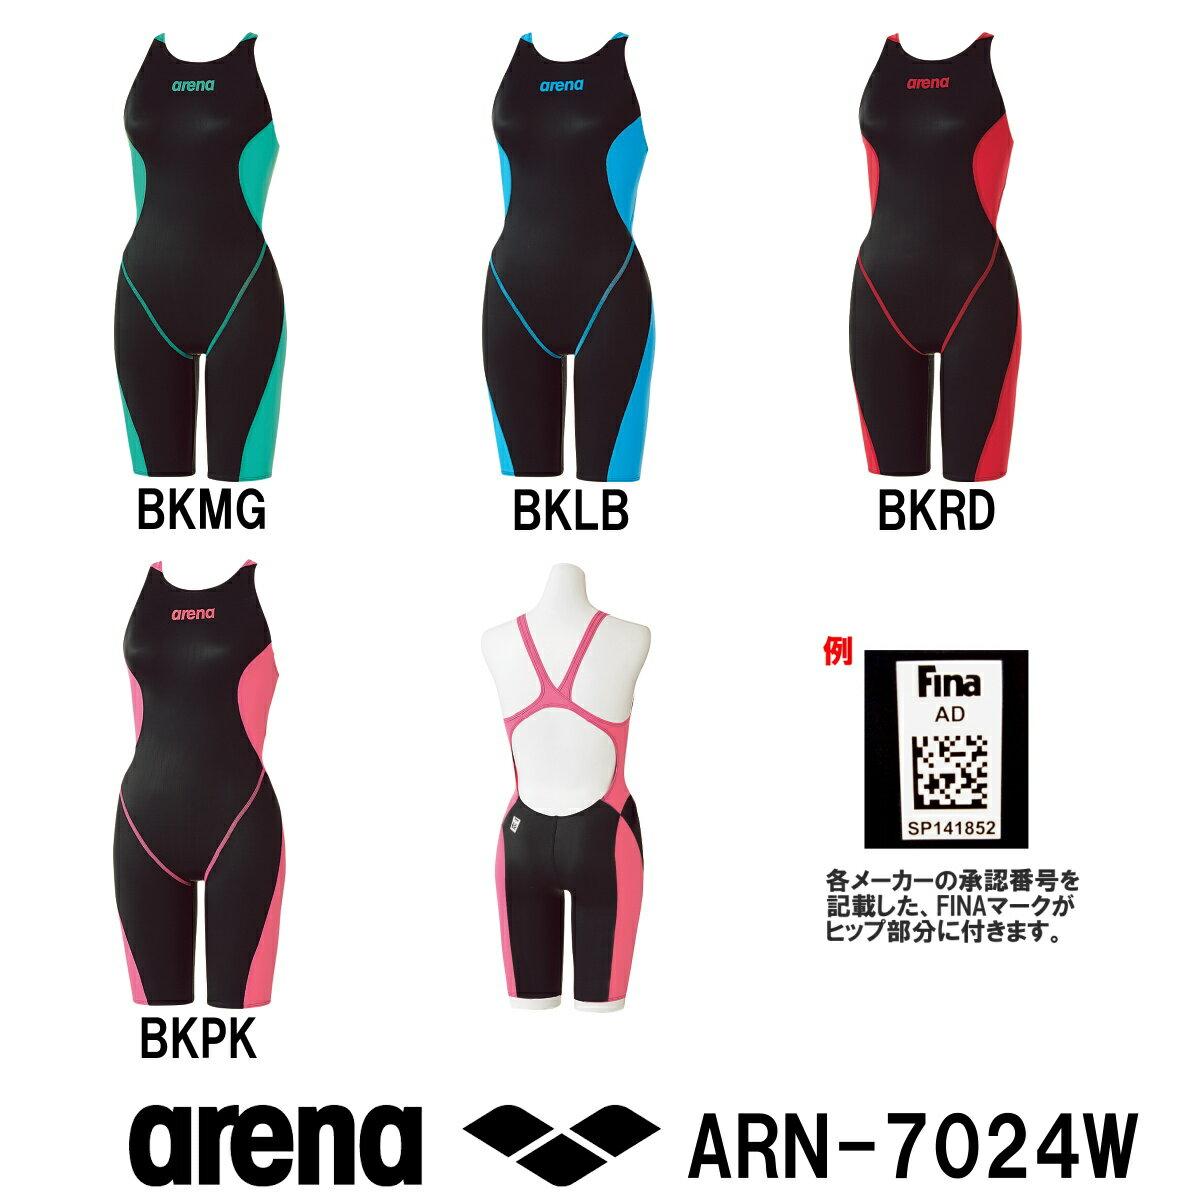 arena アリーナ 競泳水着 レディース スイムウェア スイミング ハーフスパッツ クロスバック X-PYTHON2 ARN-7024W